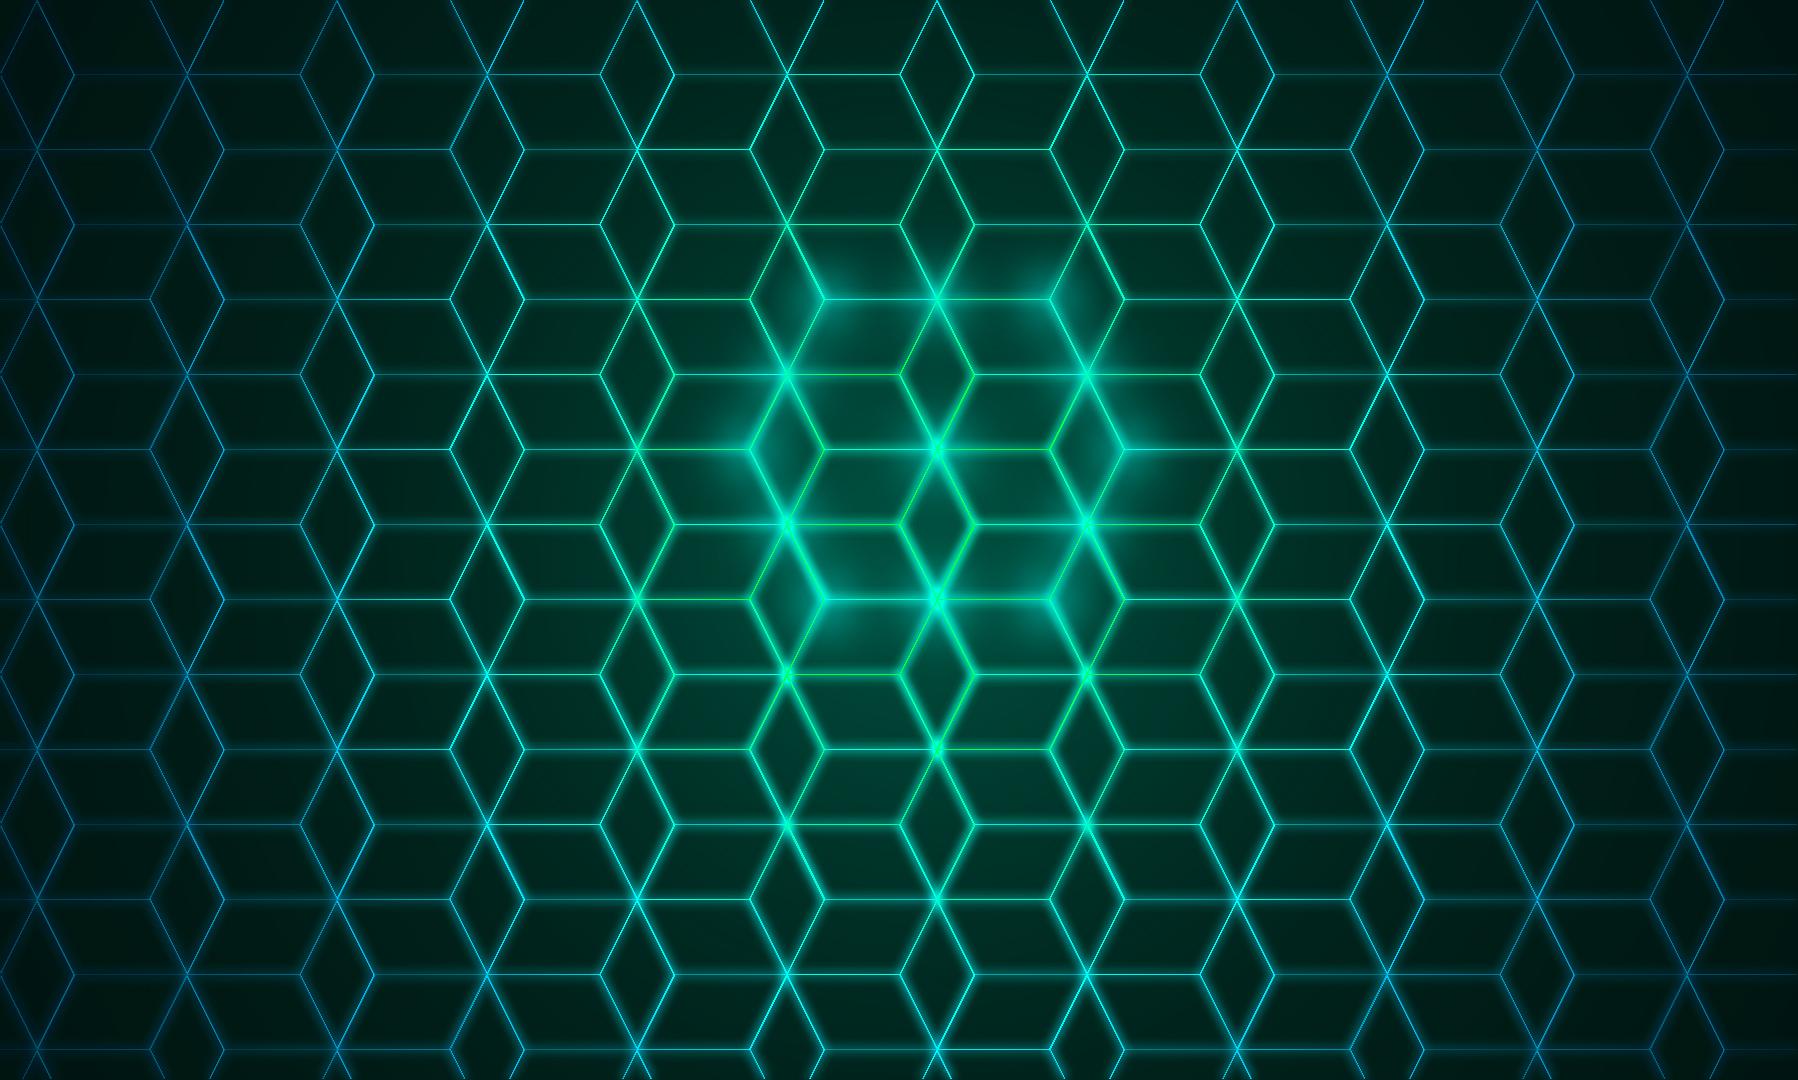 Neon Lights Wallpaper by wil1295 on DeviantArt